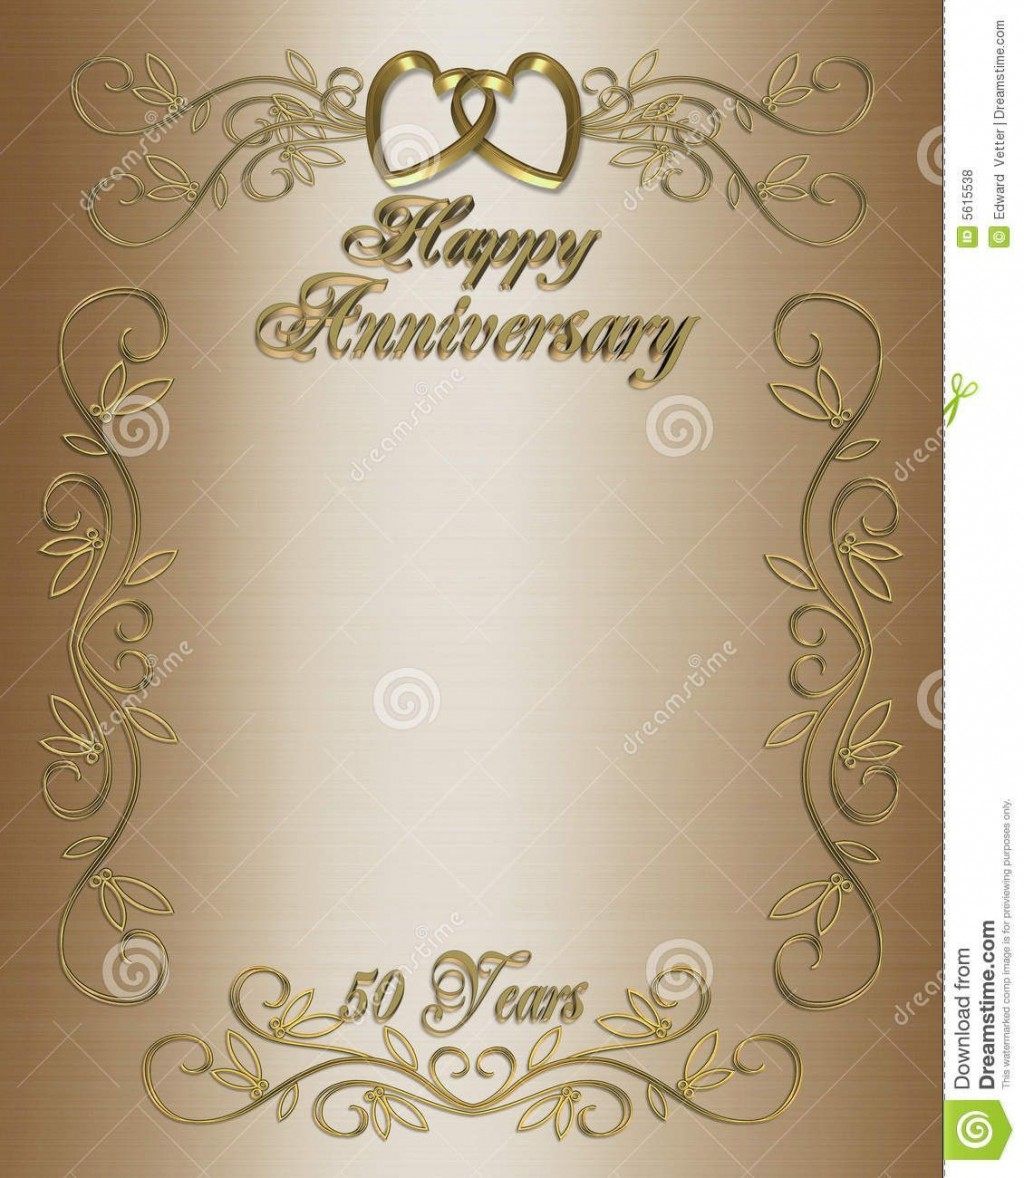 005 Fantastic 50th Wedding Anniversary Invitation Template Free Download Idea  GoldenLarge